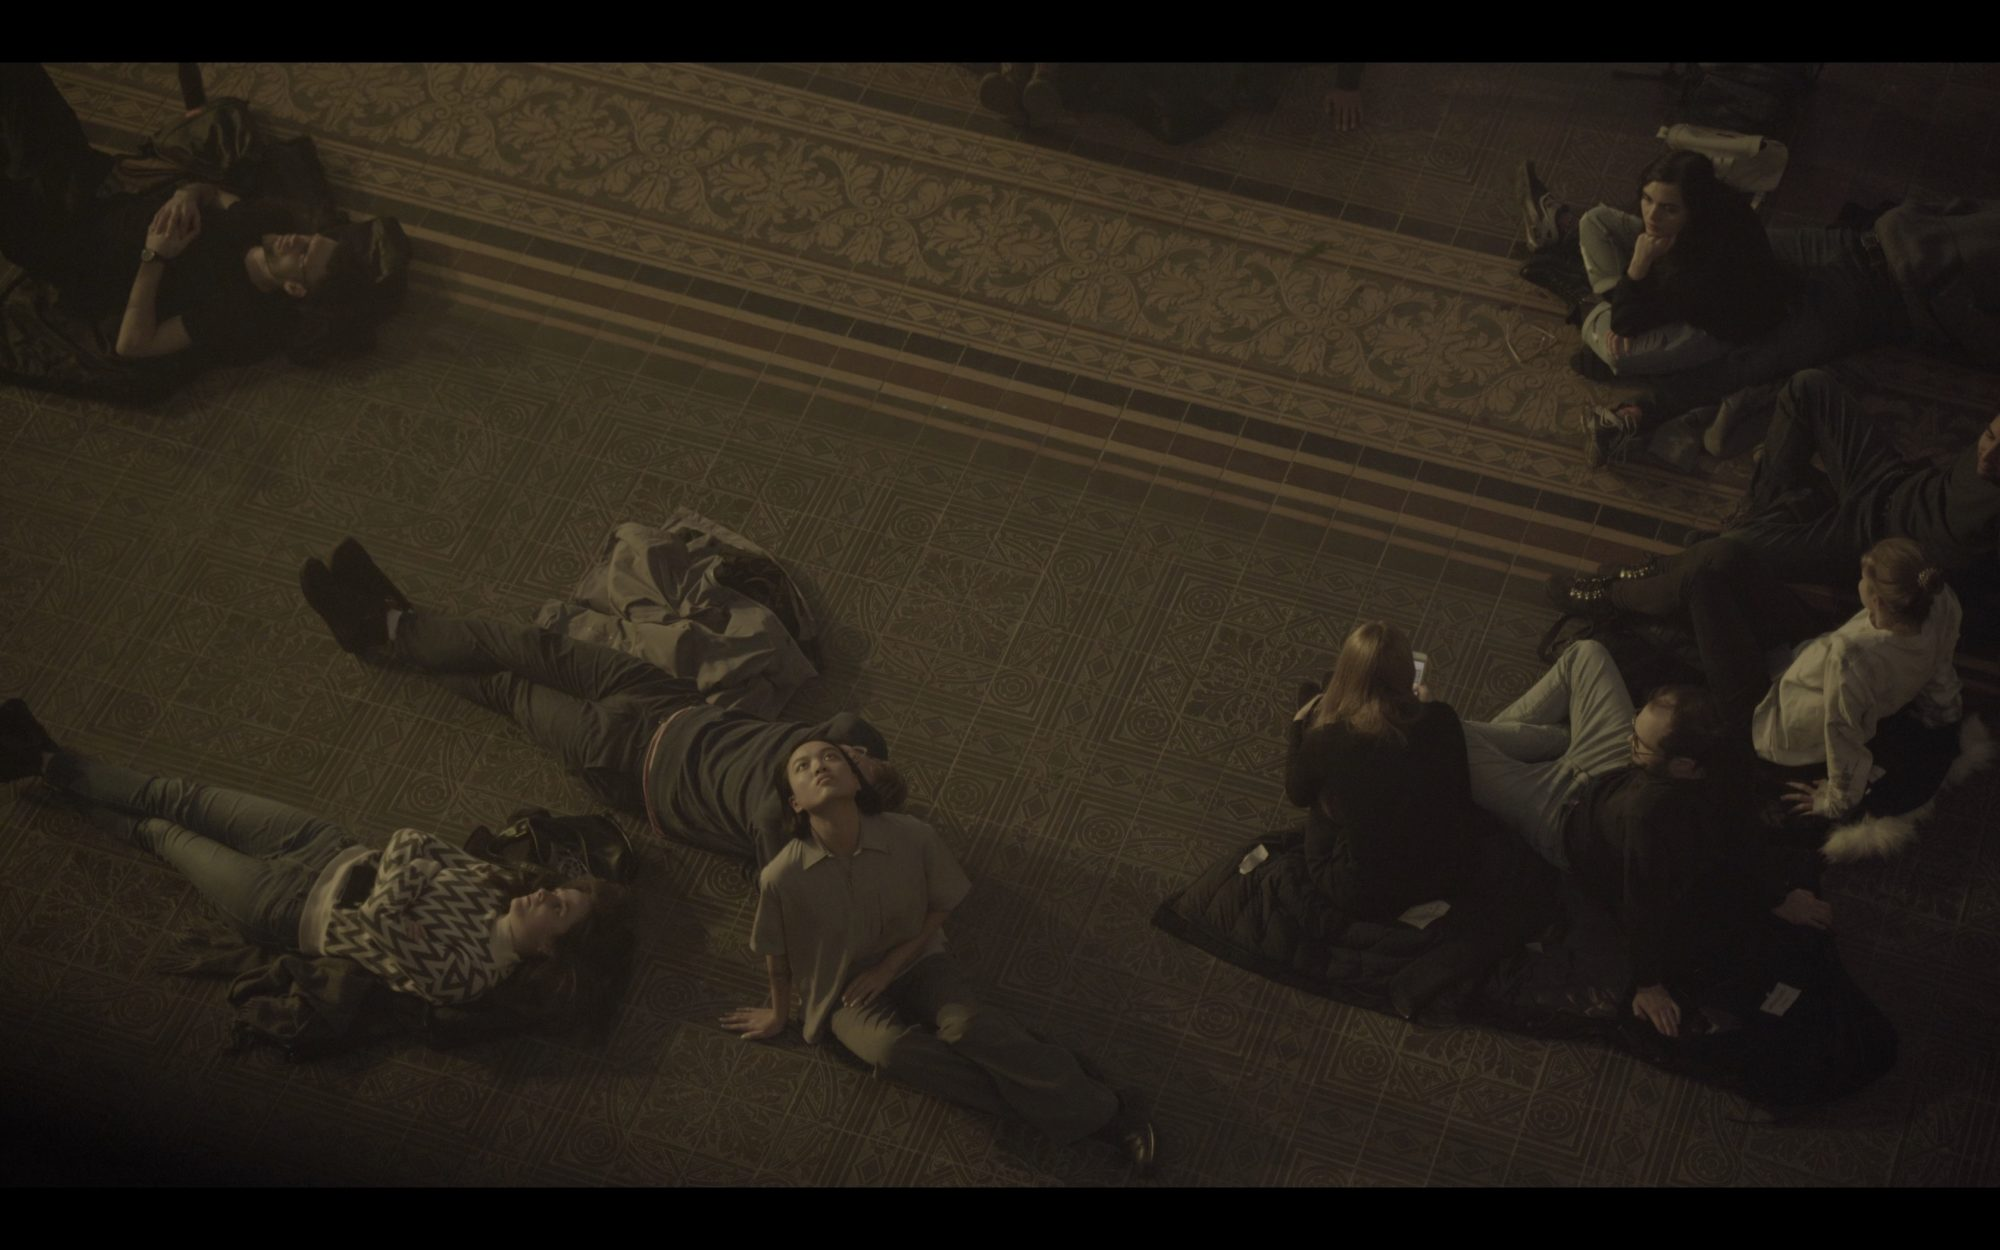 Dead Time Blue, footage still, Martin Gropius Bau, 2020